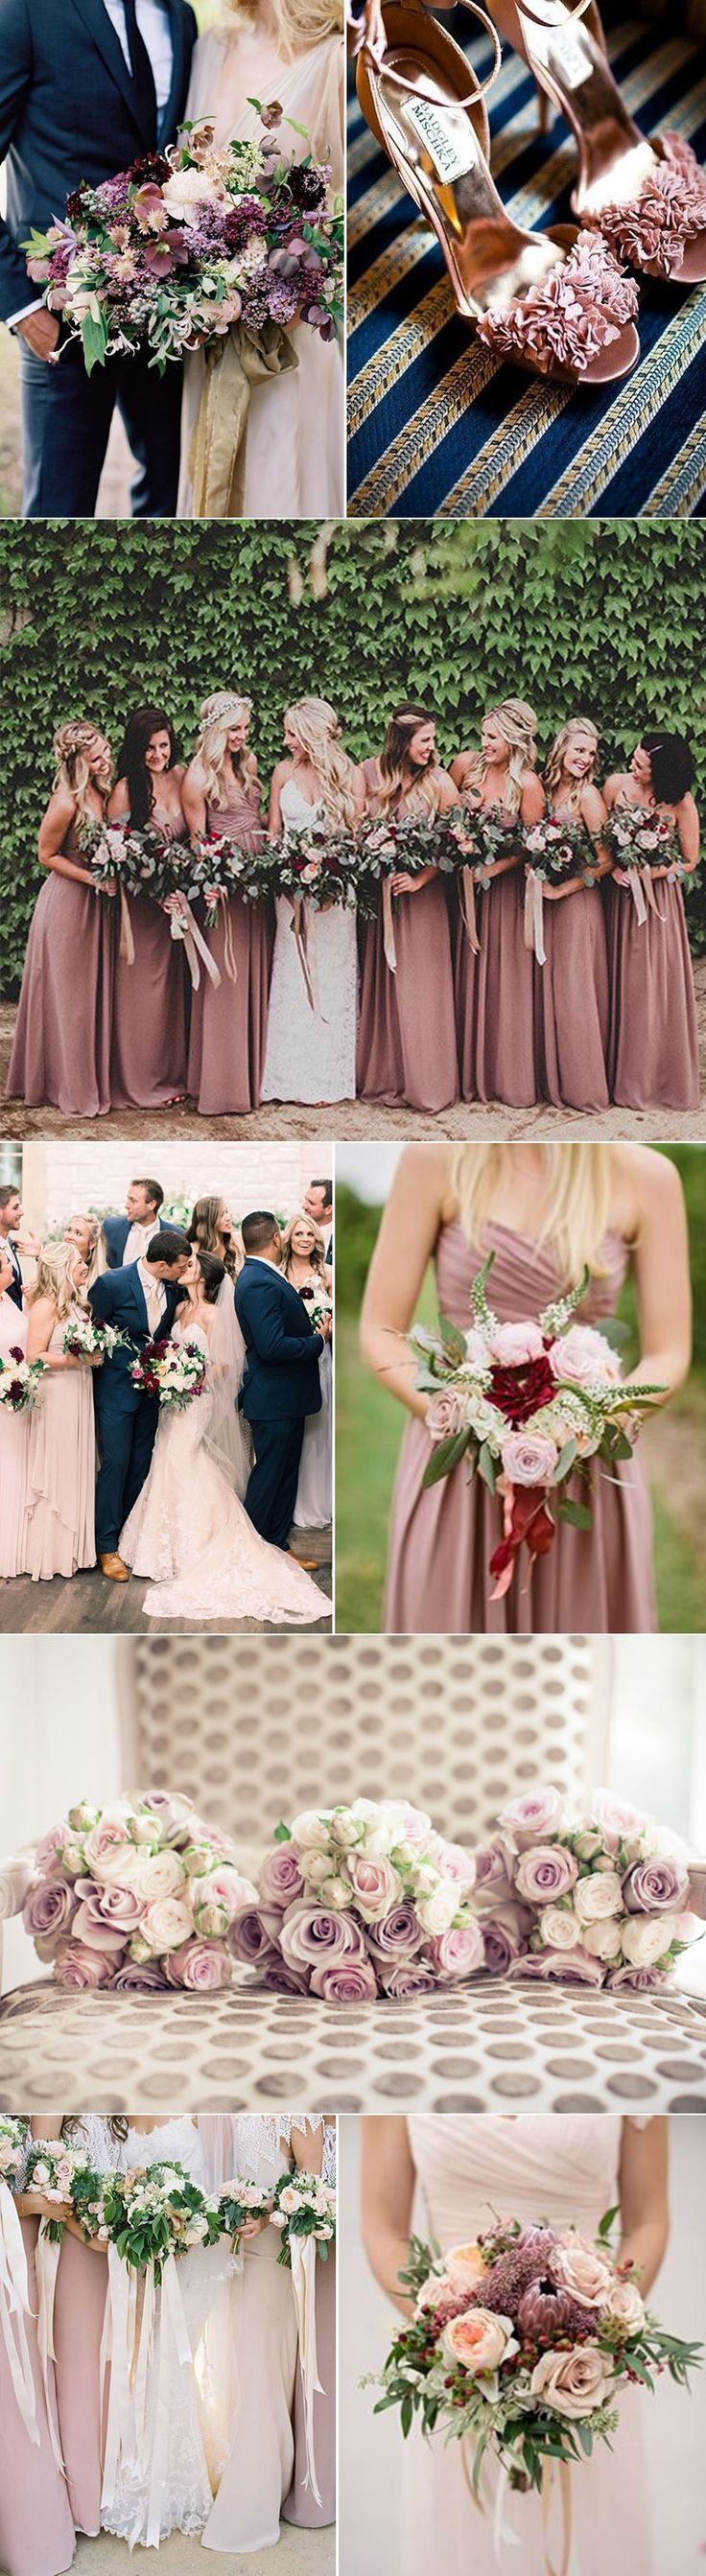 Best Of Wedding Color Combination Ideas Trends 2017